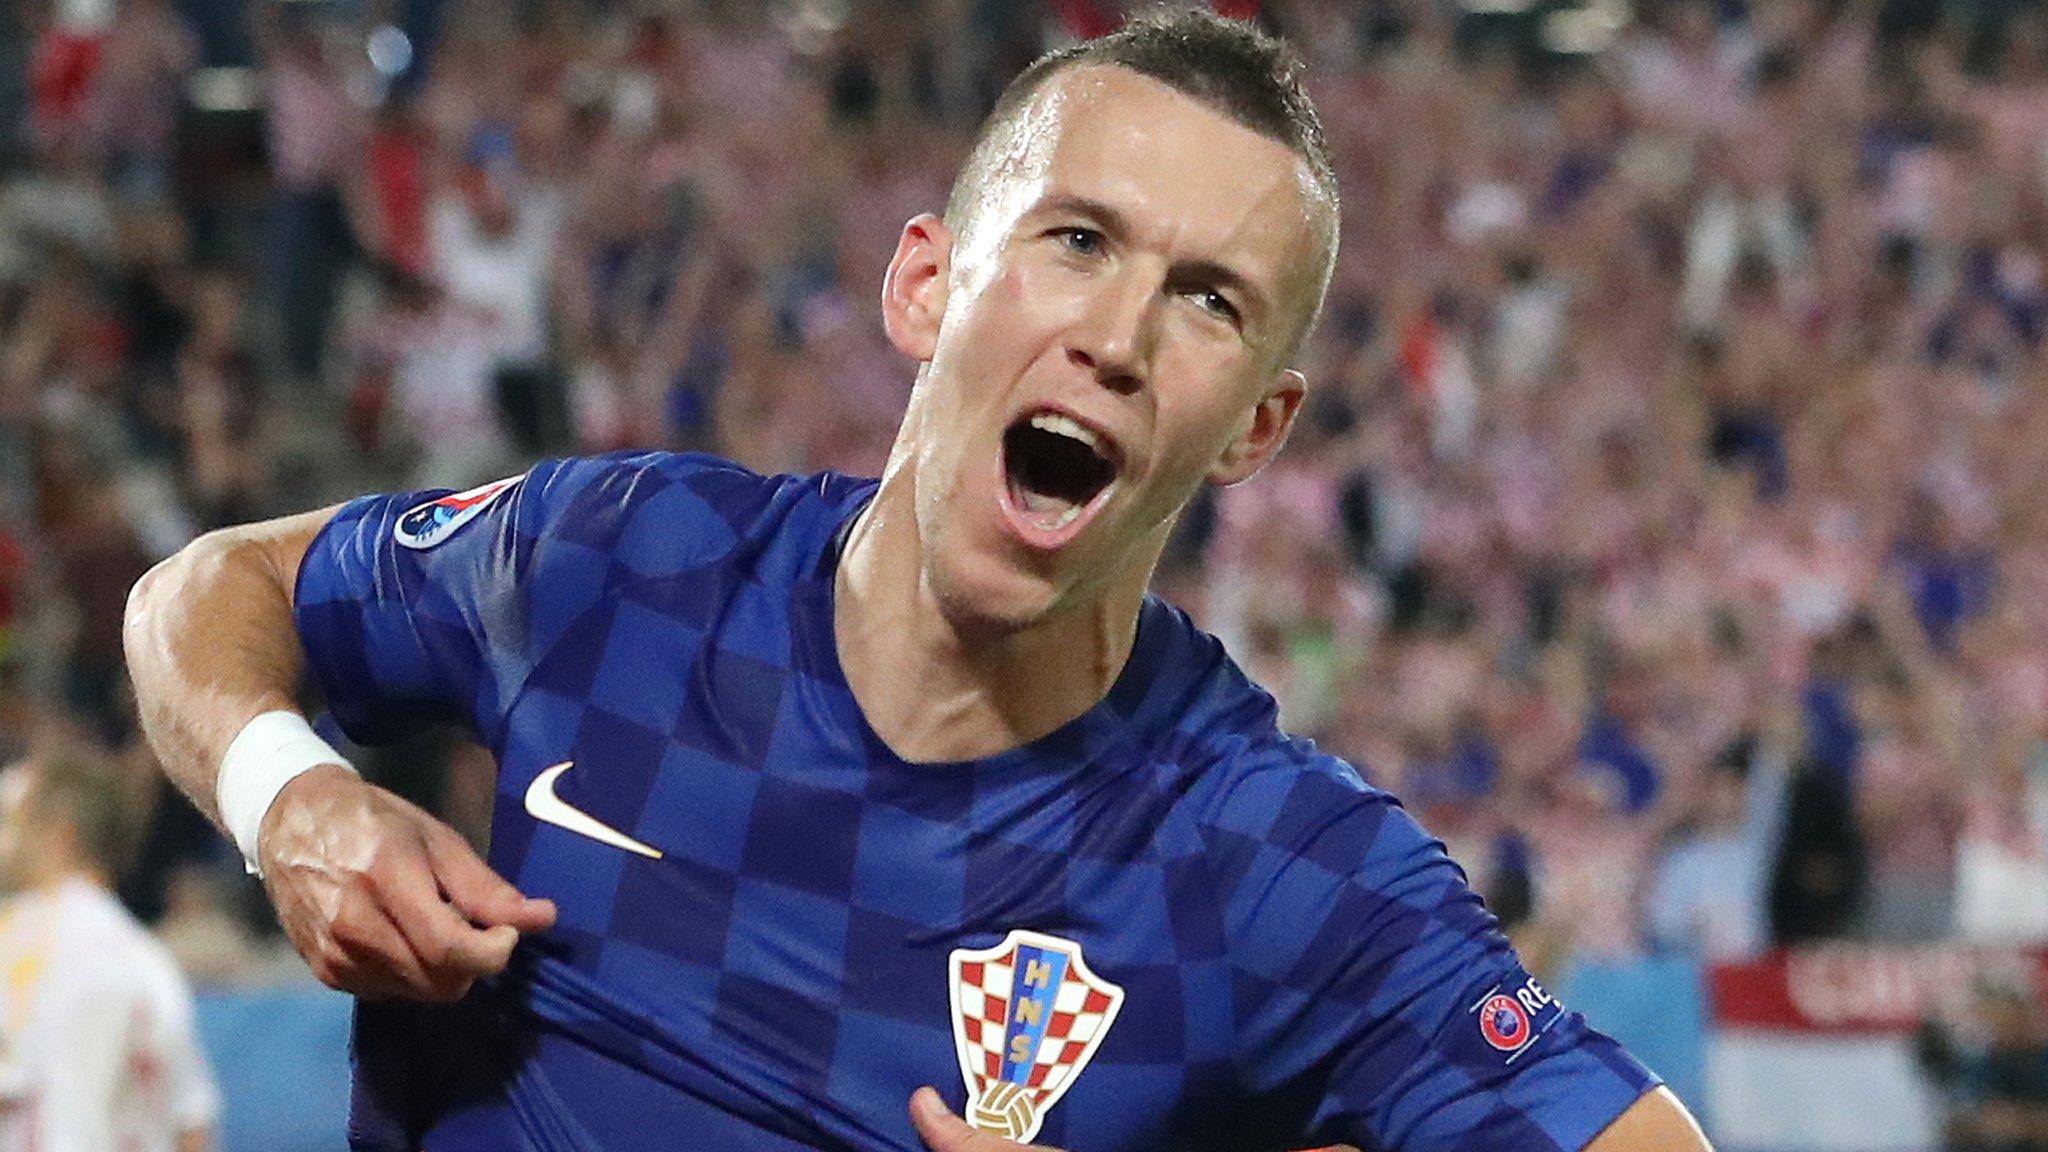 Usas scoreless draw vs serbia offers glimpse into arenas preferences foxsports com - Croatia Condemn Spain To Italy